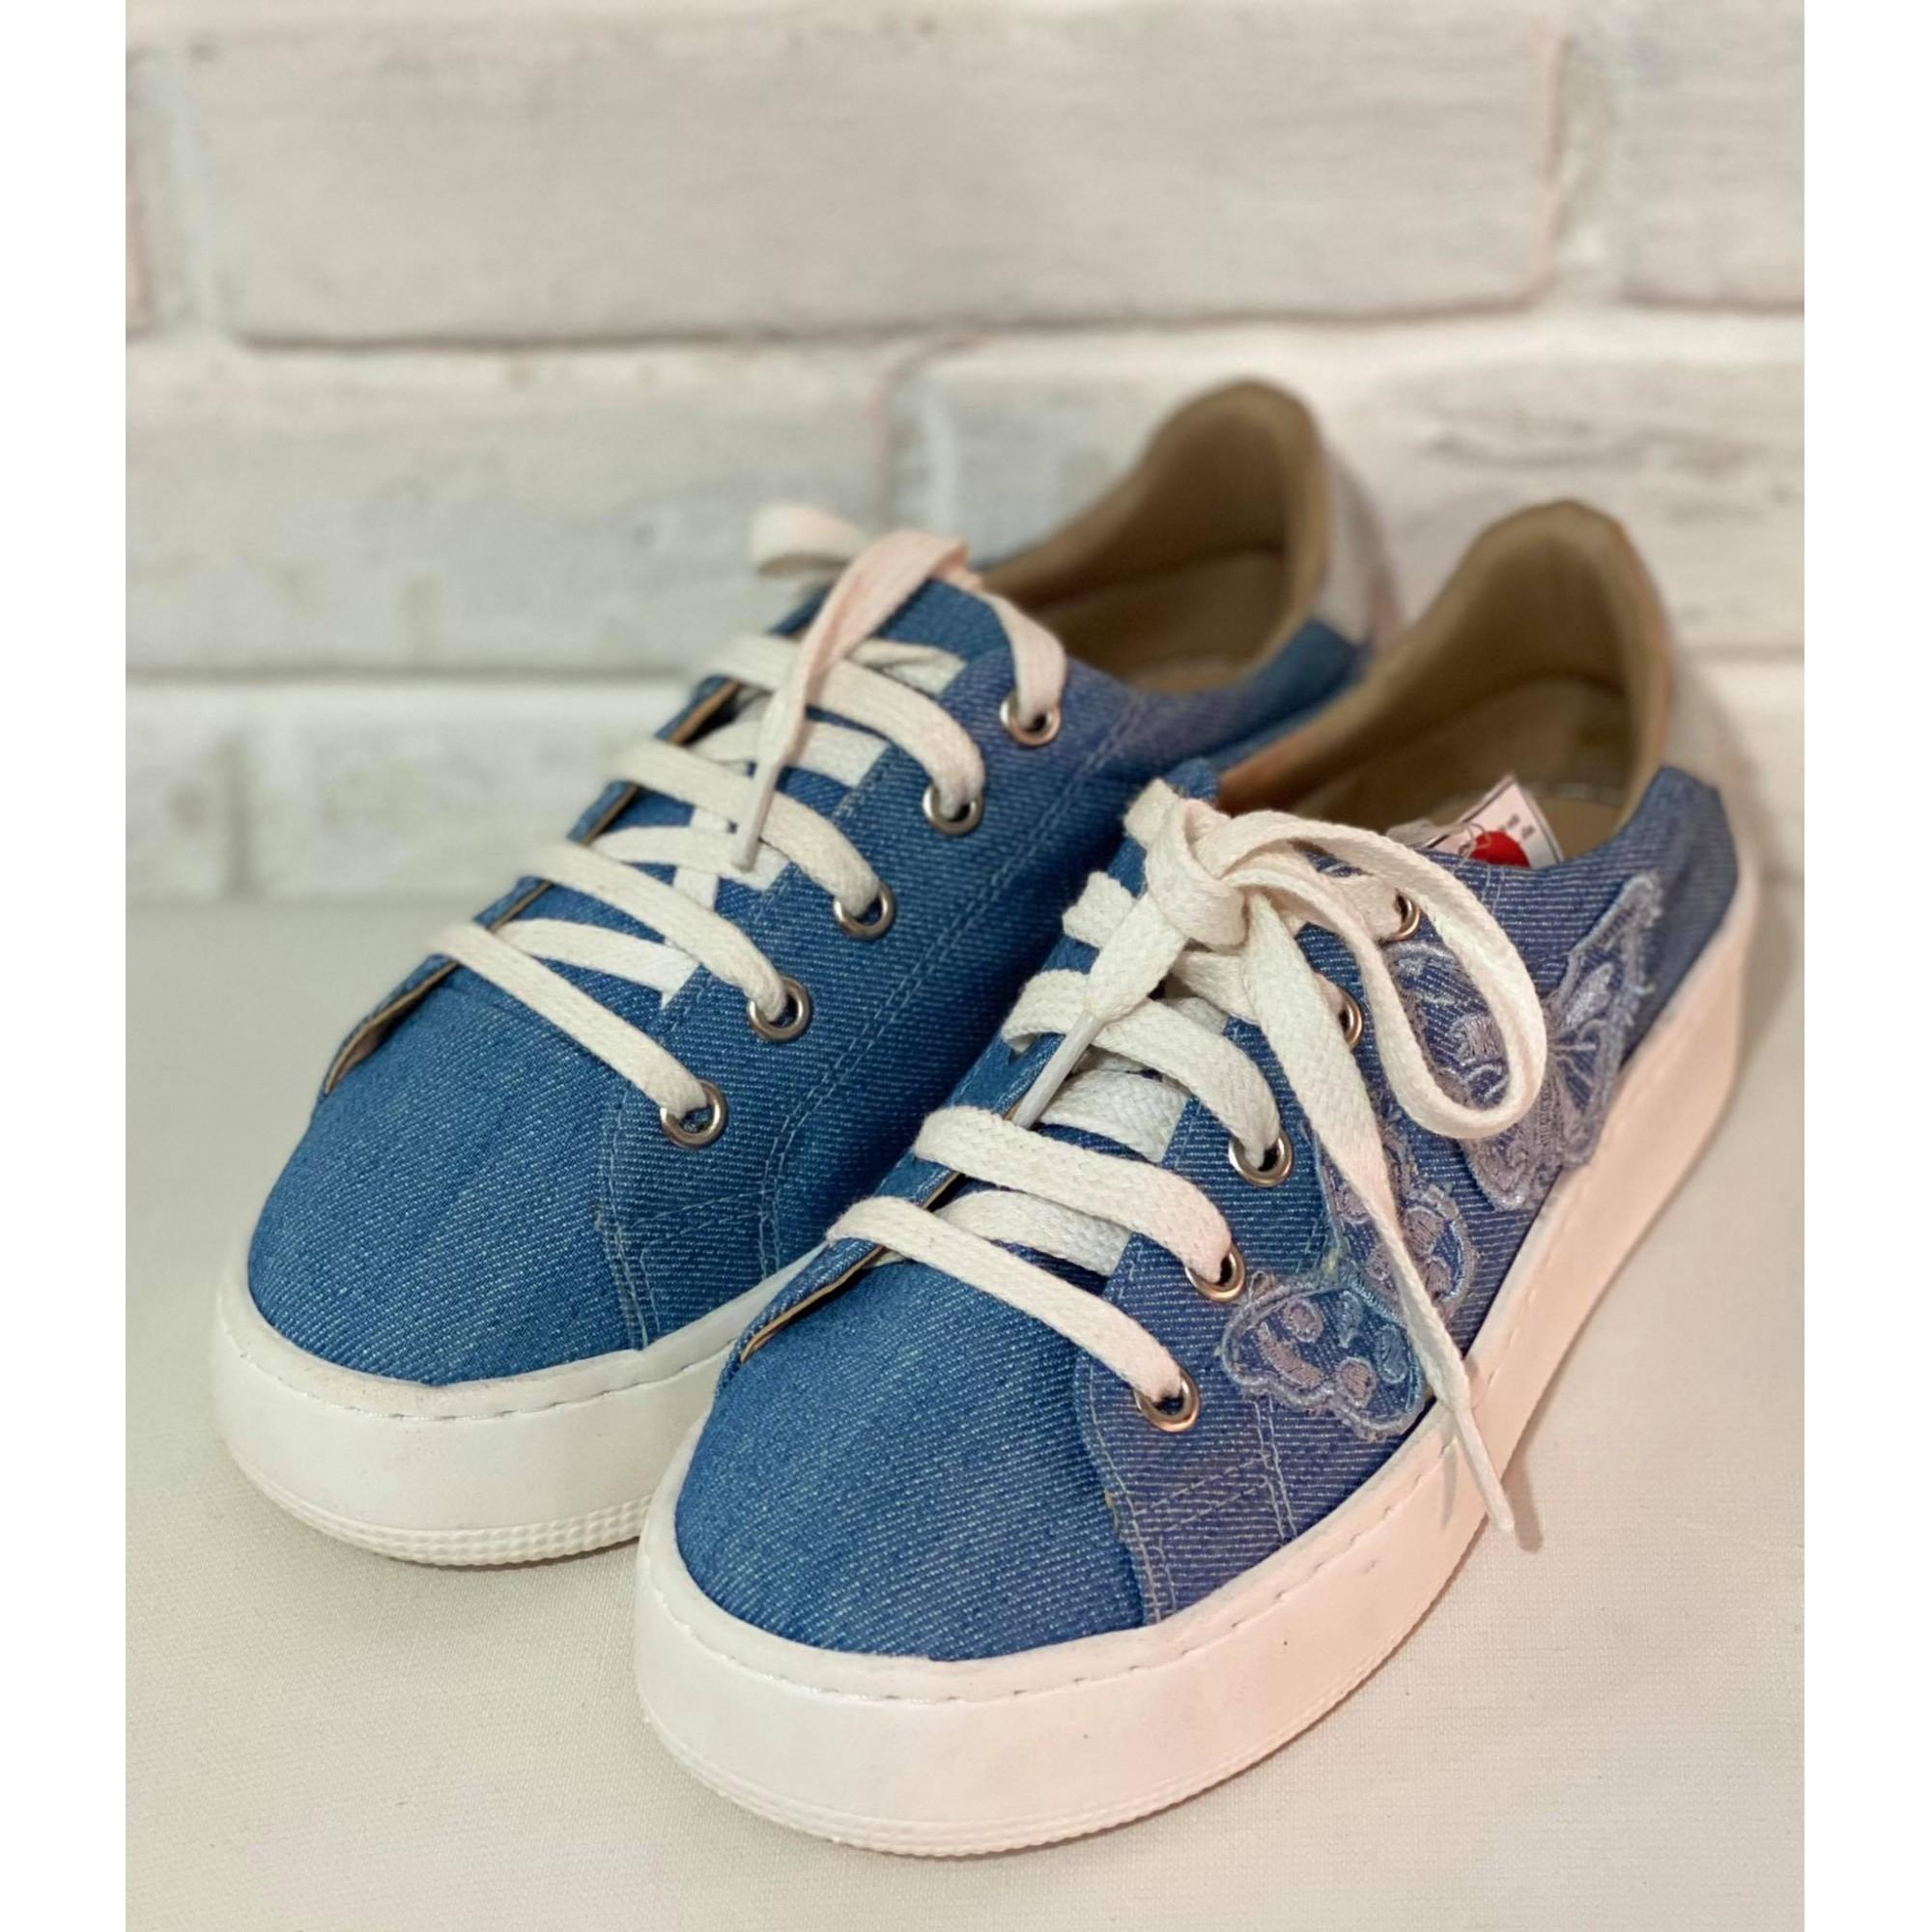 Sapatênis Feminino Prata Couro 5480  Jeans